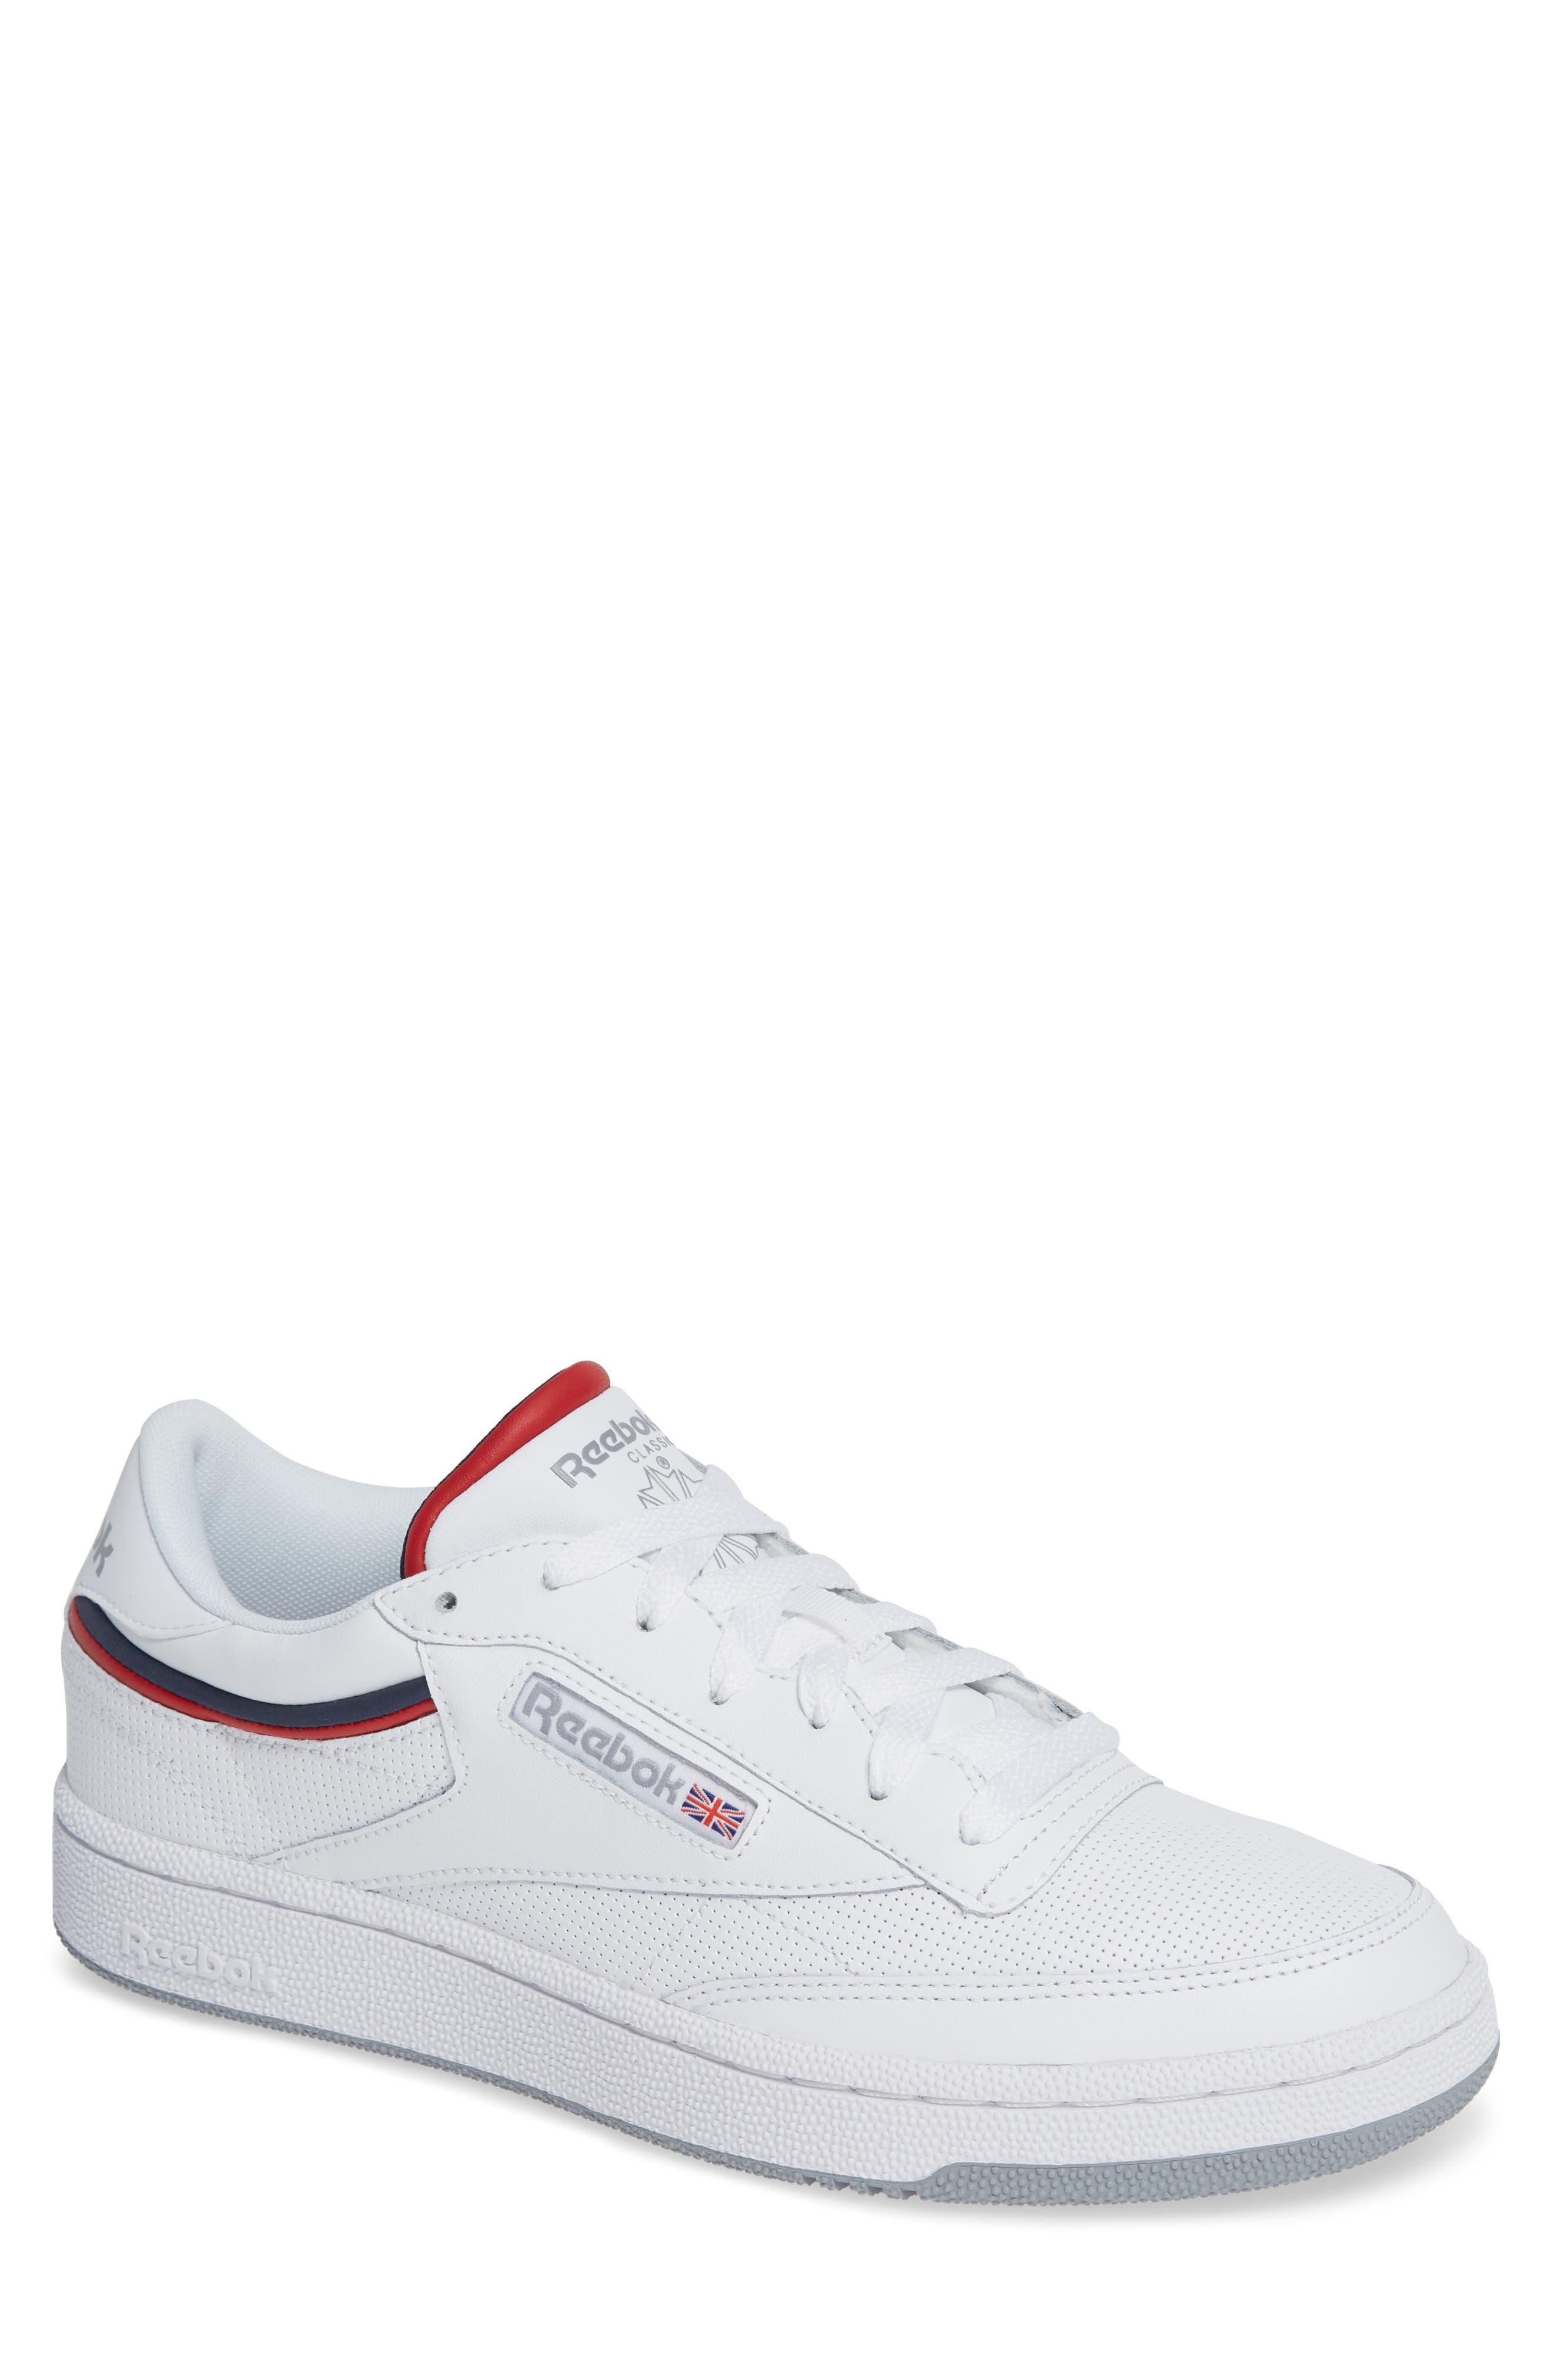 Club C 85 Sneaker,                         Main,                         color, WHITE/ COLLEGIATE NAVY/ RED